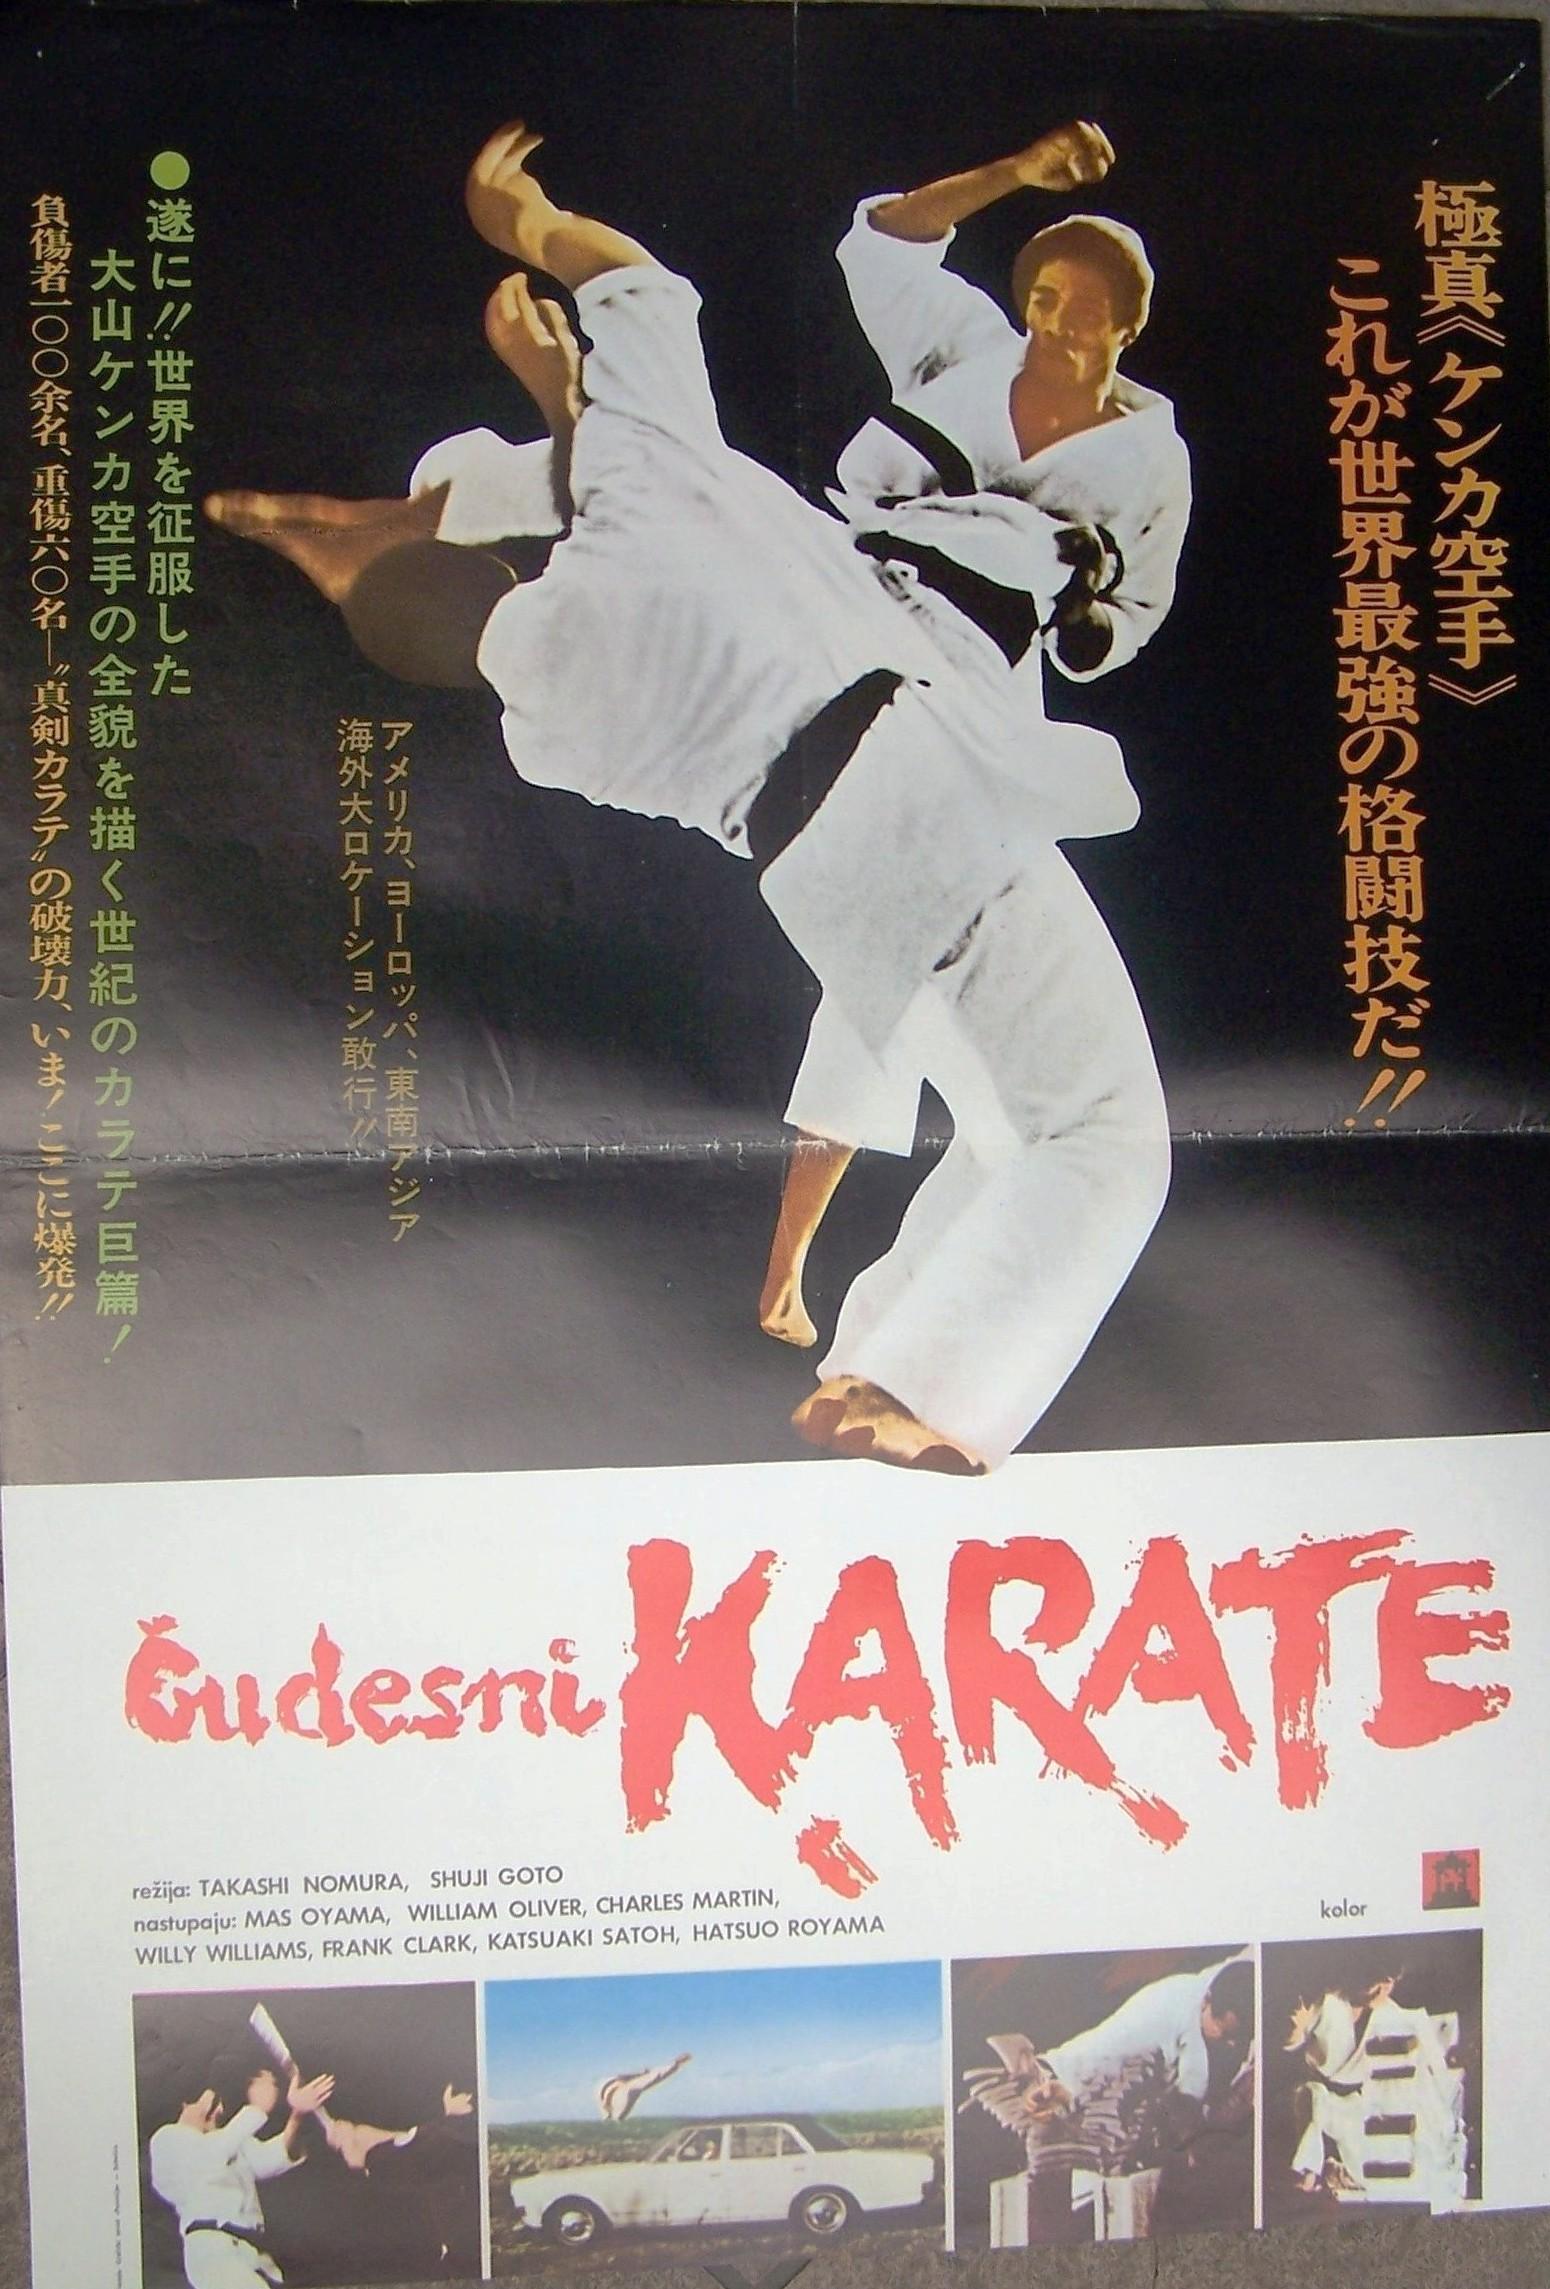 Čudesni Karate